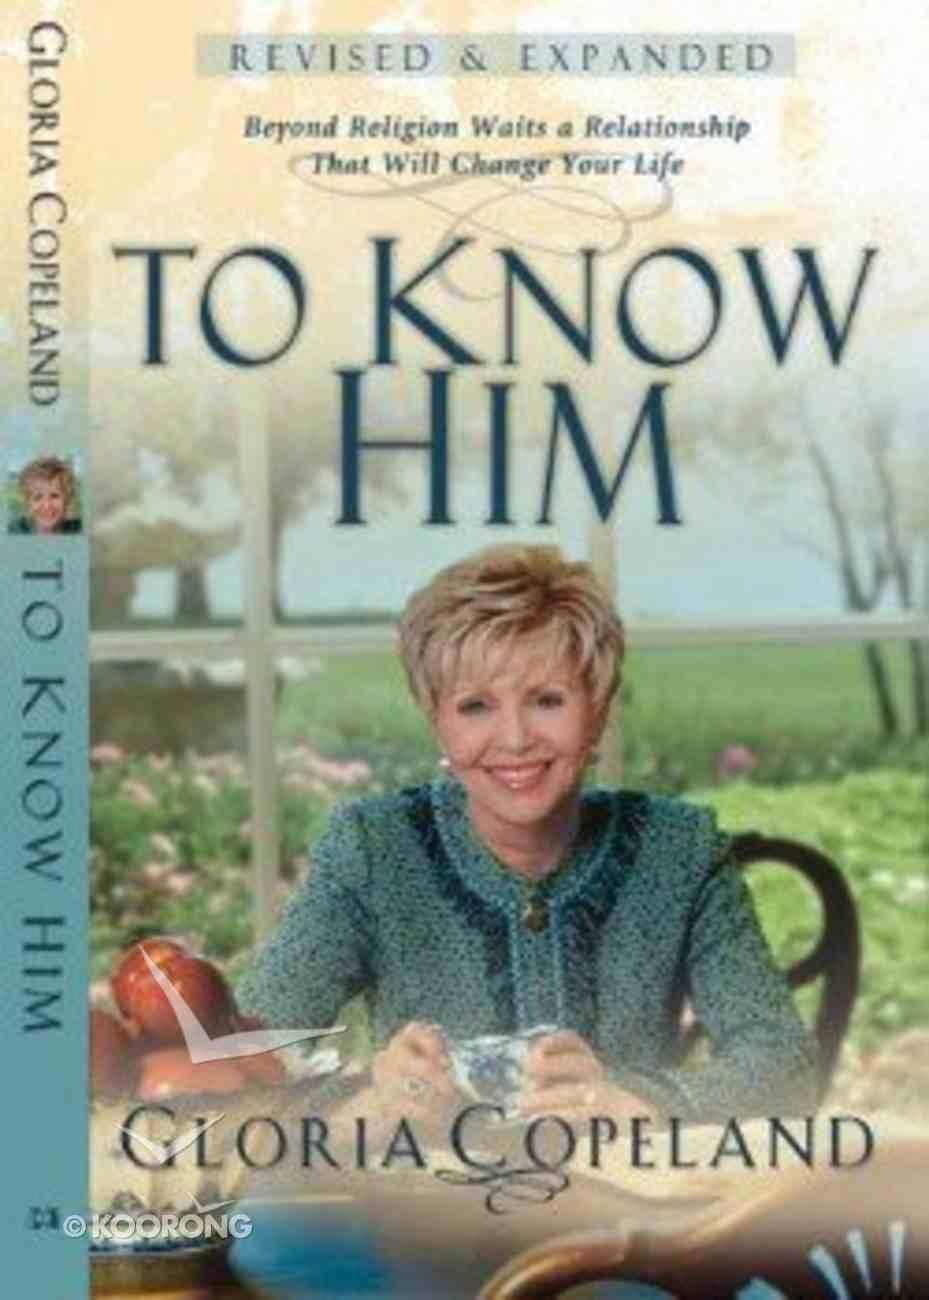 To Know Him (2005) Hardback